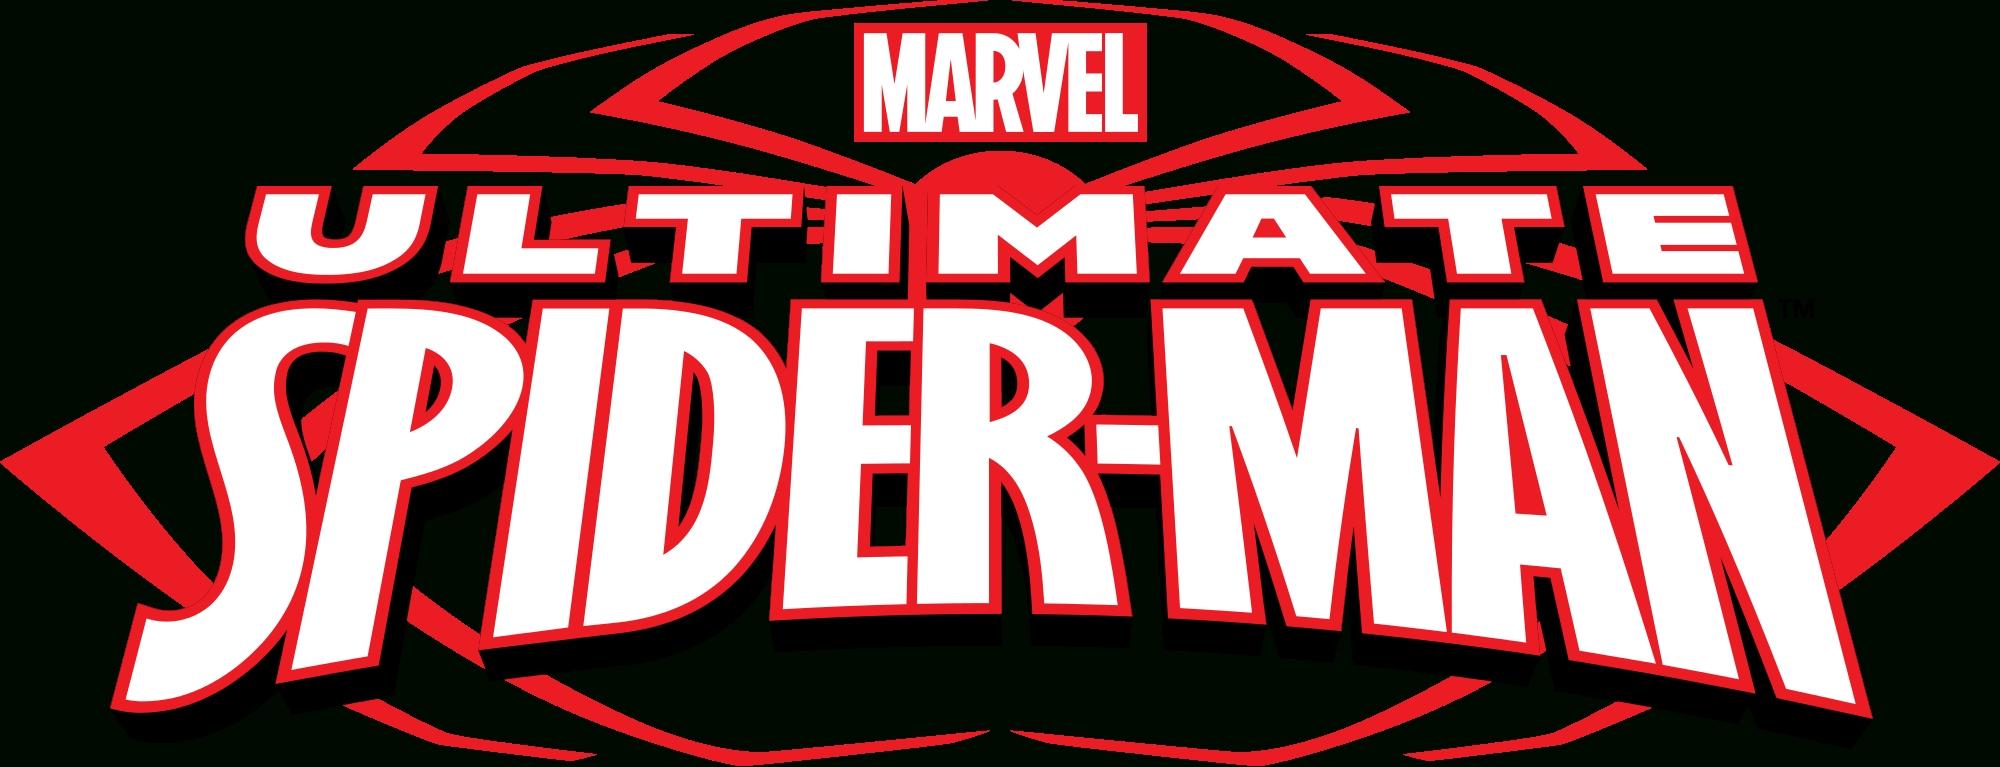 fichier:ultimate spider-man (série d'animation) — wikipédia